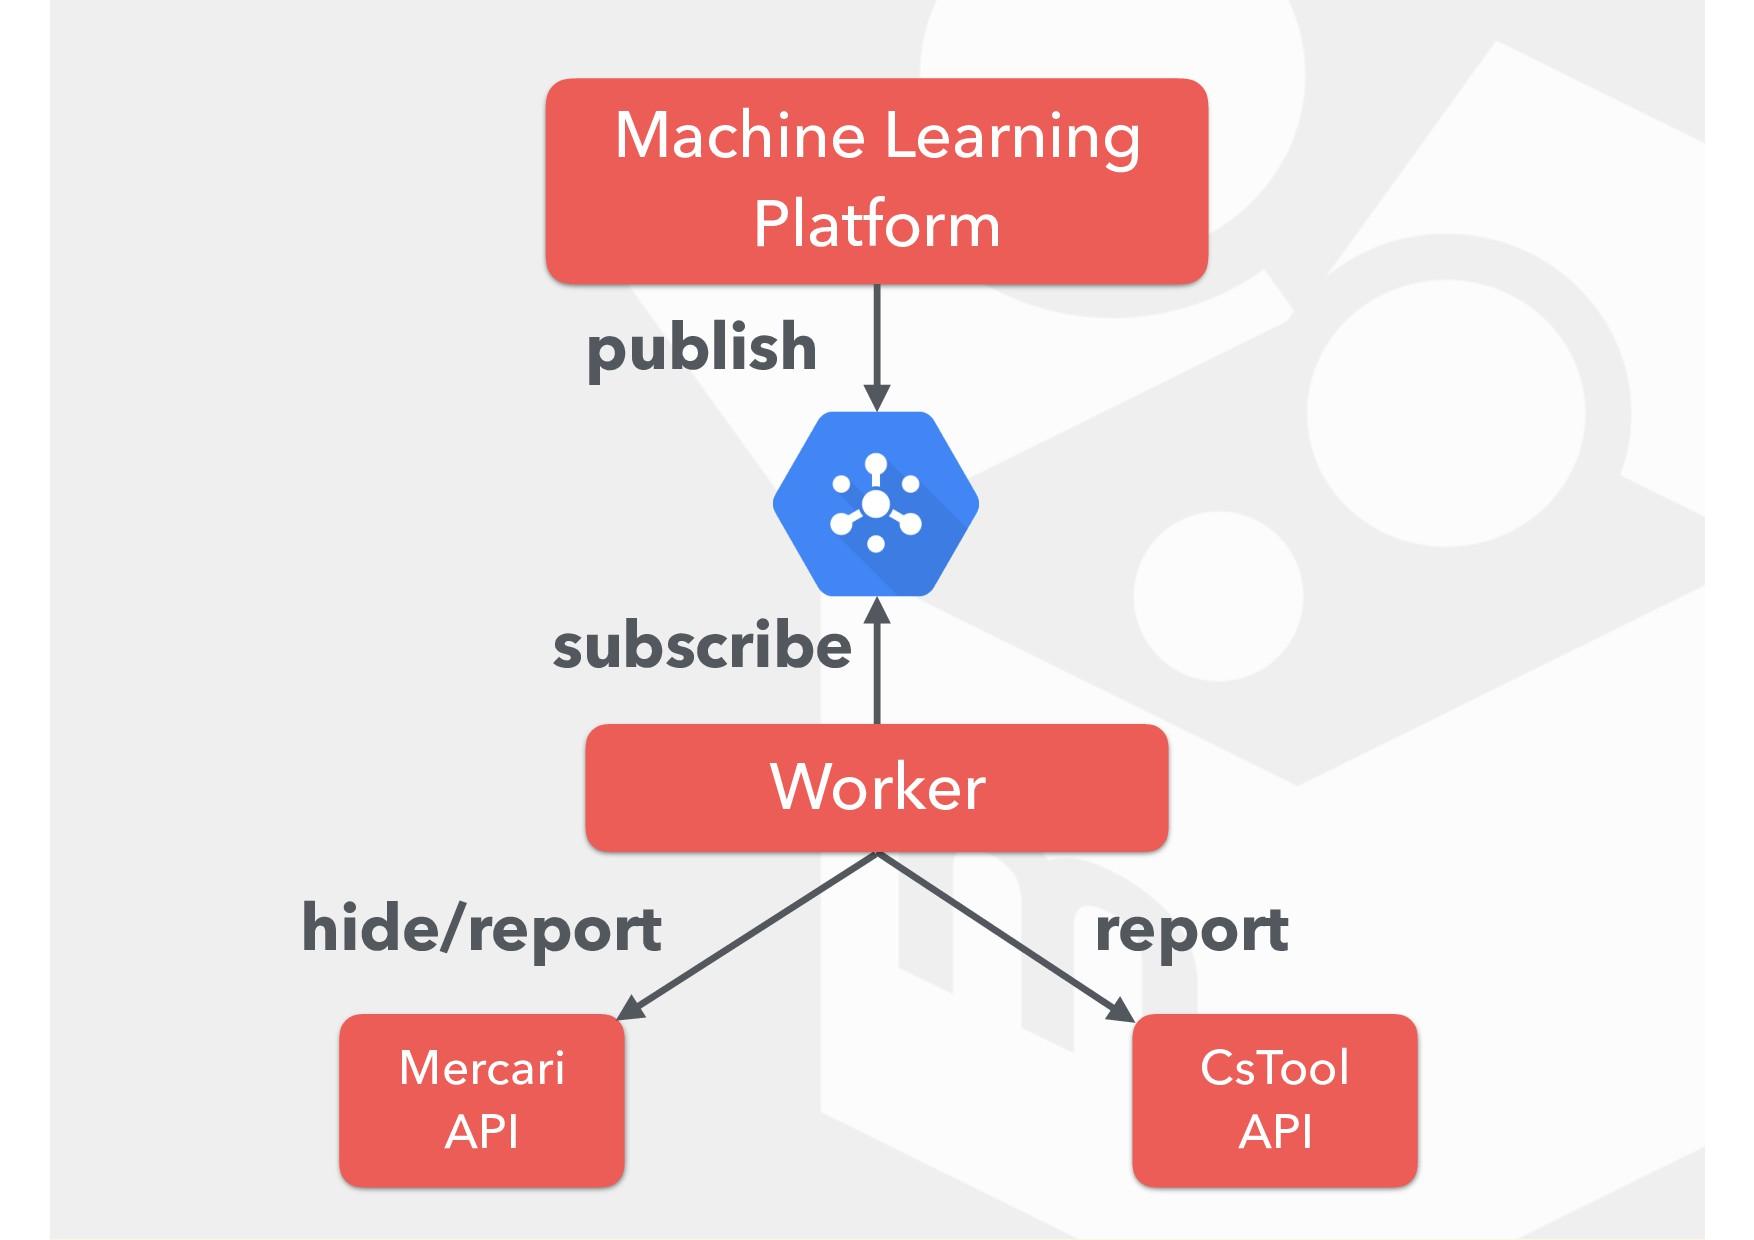 CsTool API Machine Learning Platform Mercari...